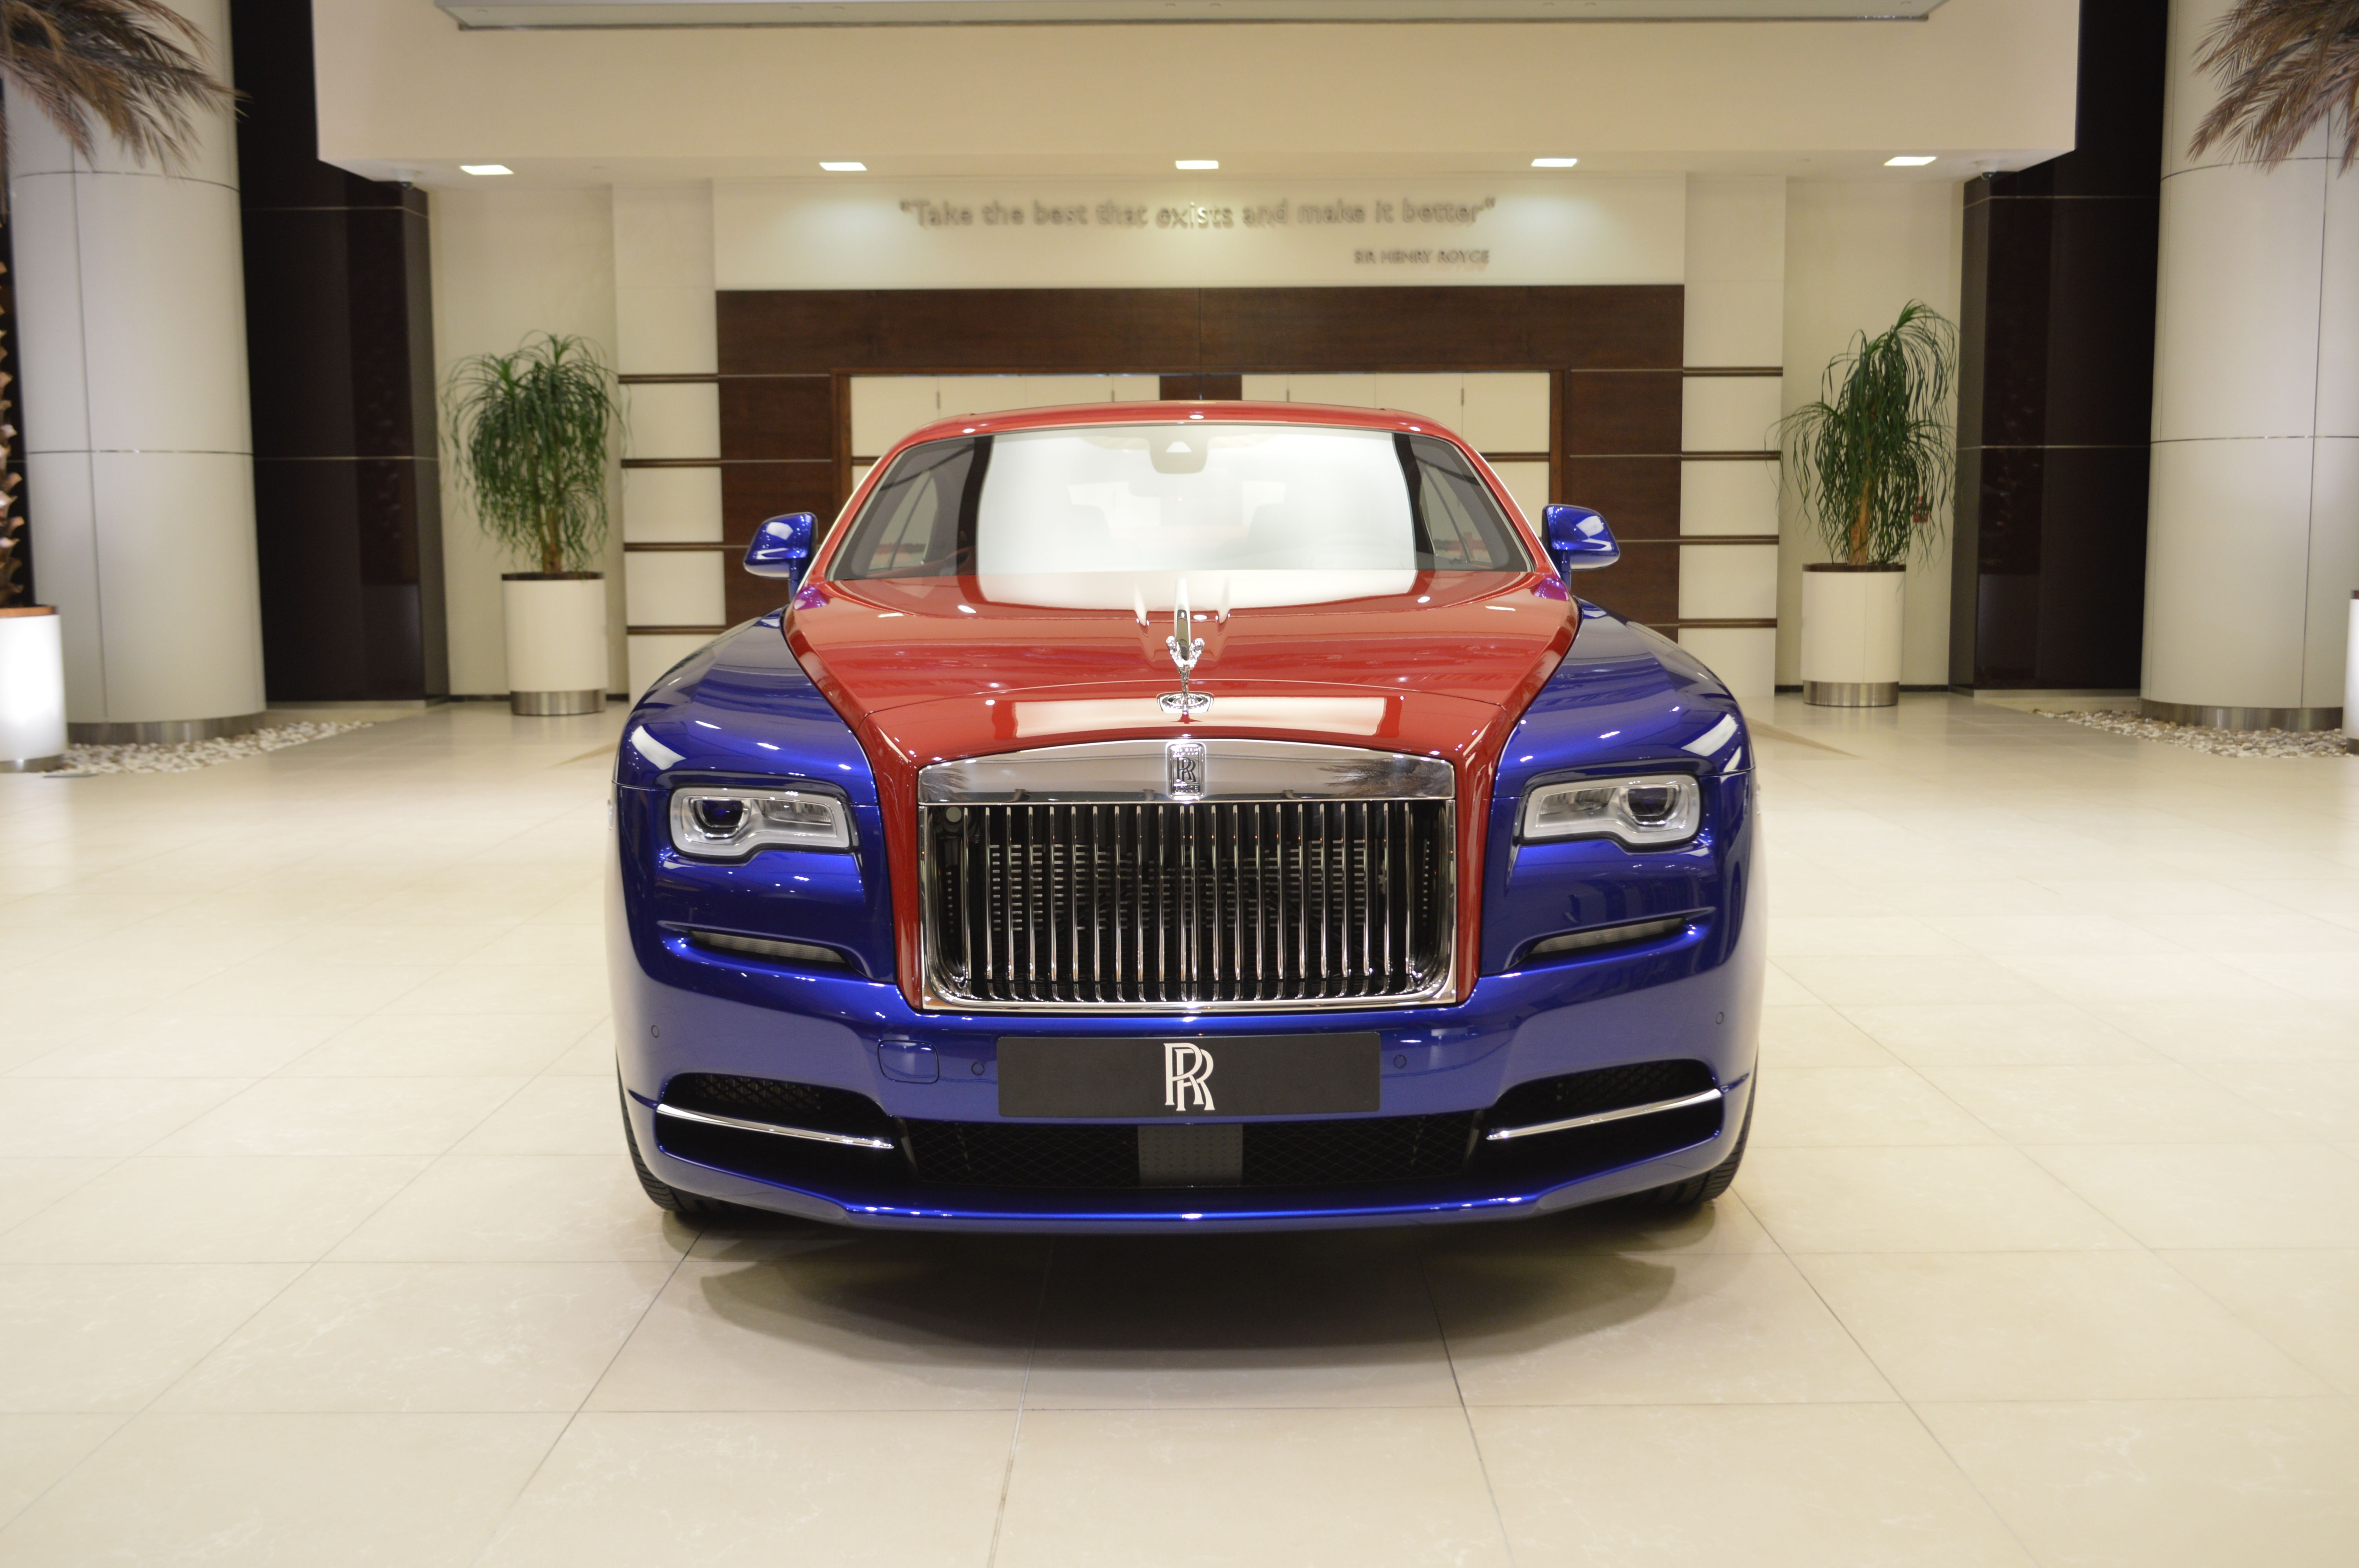 Rolls Royce Wraith In 2020 Rolls Royce Wraith Rolls Royce Paint Schemes